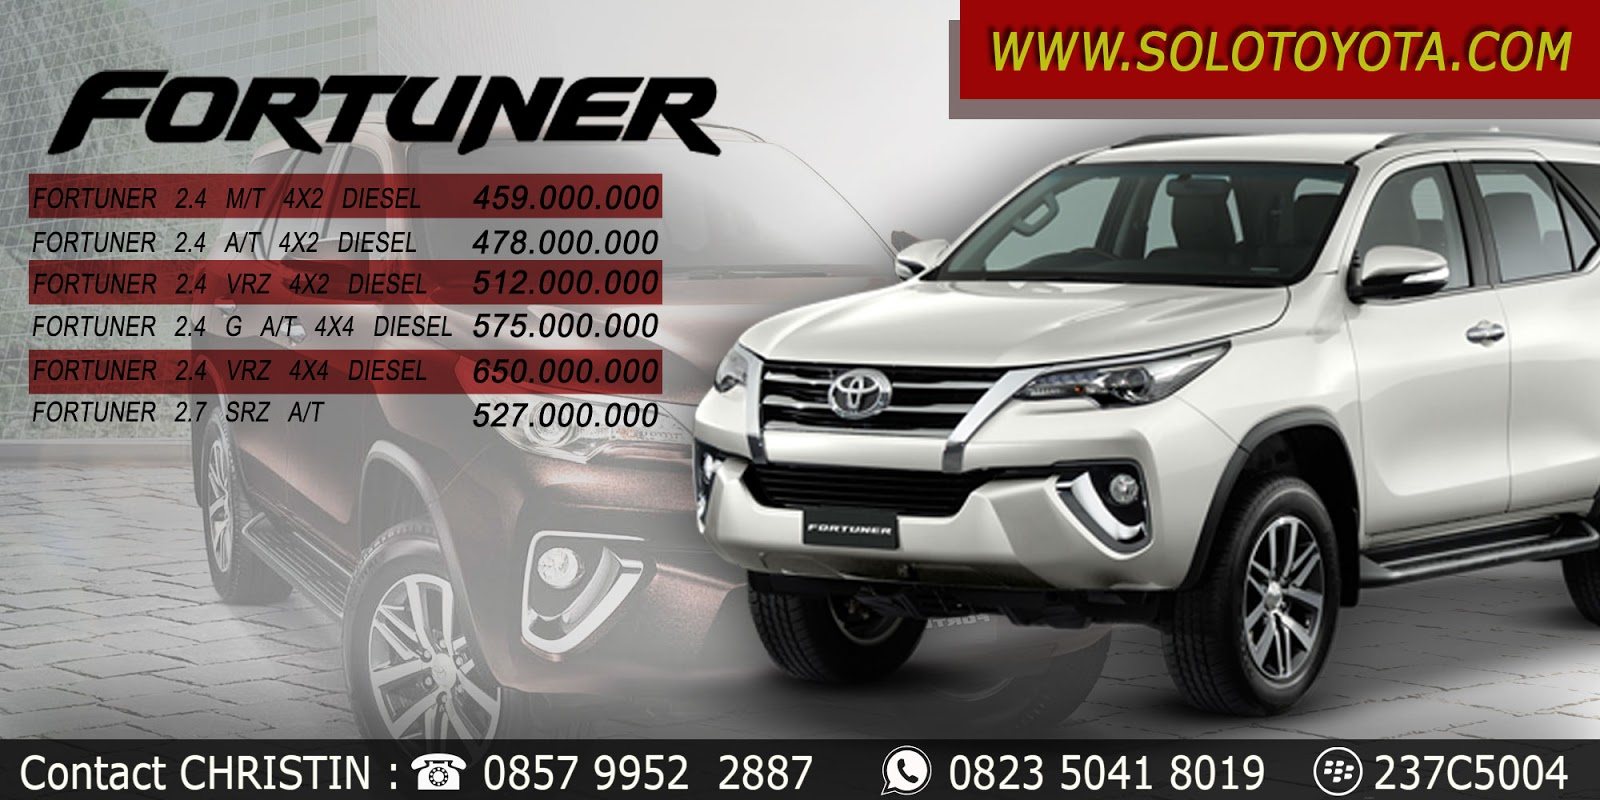 All New Camry 2017 Indonesia Harga Grand Veloz Vs Ertiga Dreza Toyota Fortuner 2019 Daftar